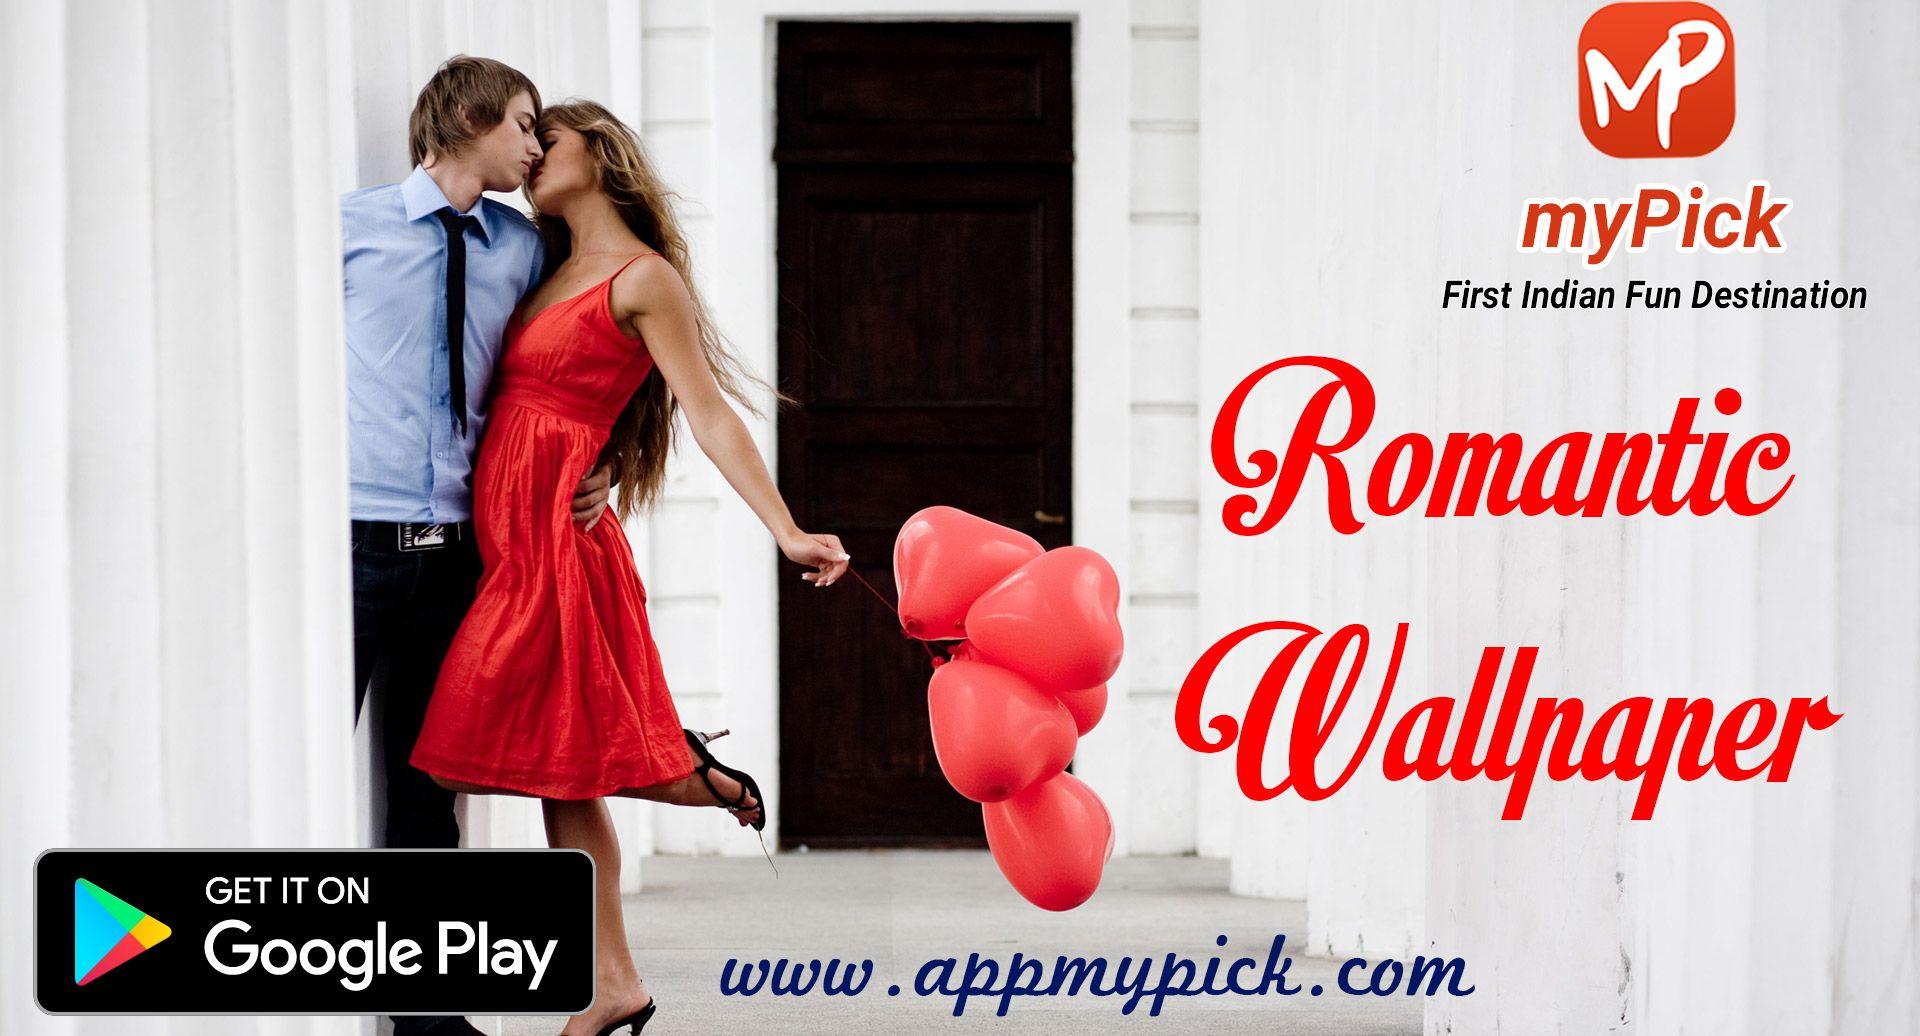 Mobili Romantici ~ Romantic wallpaper free download download free mobile application